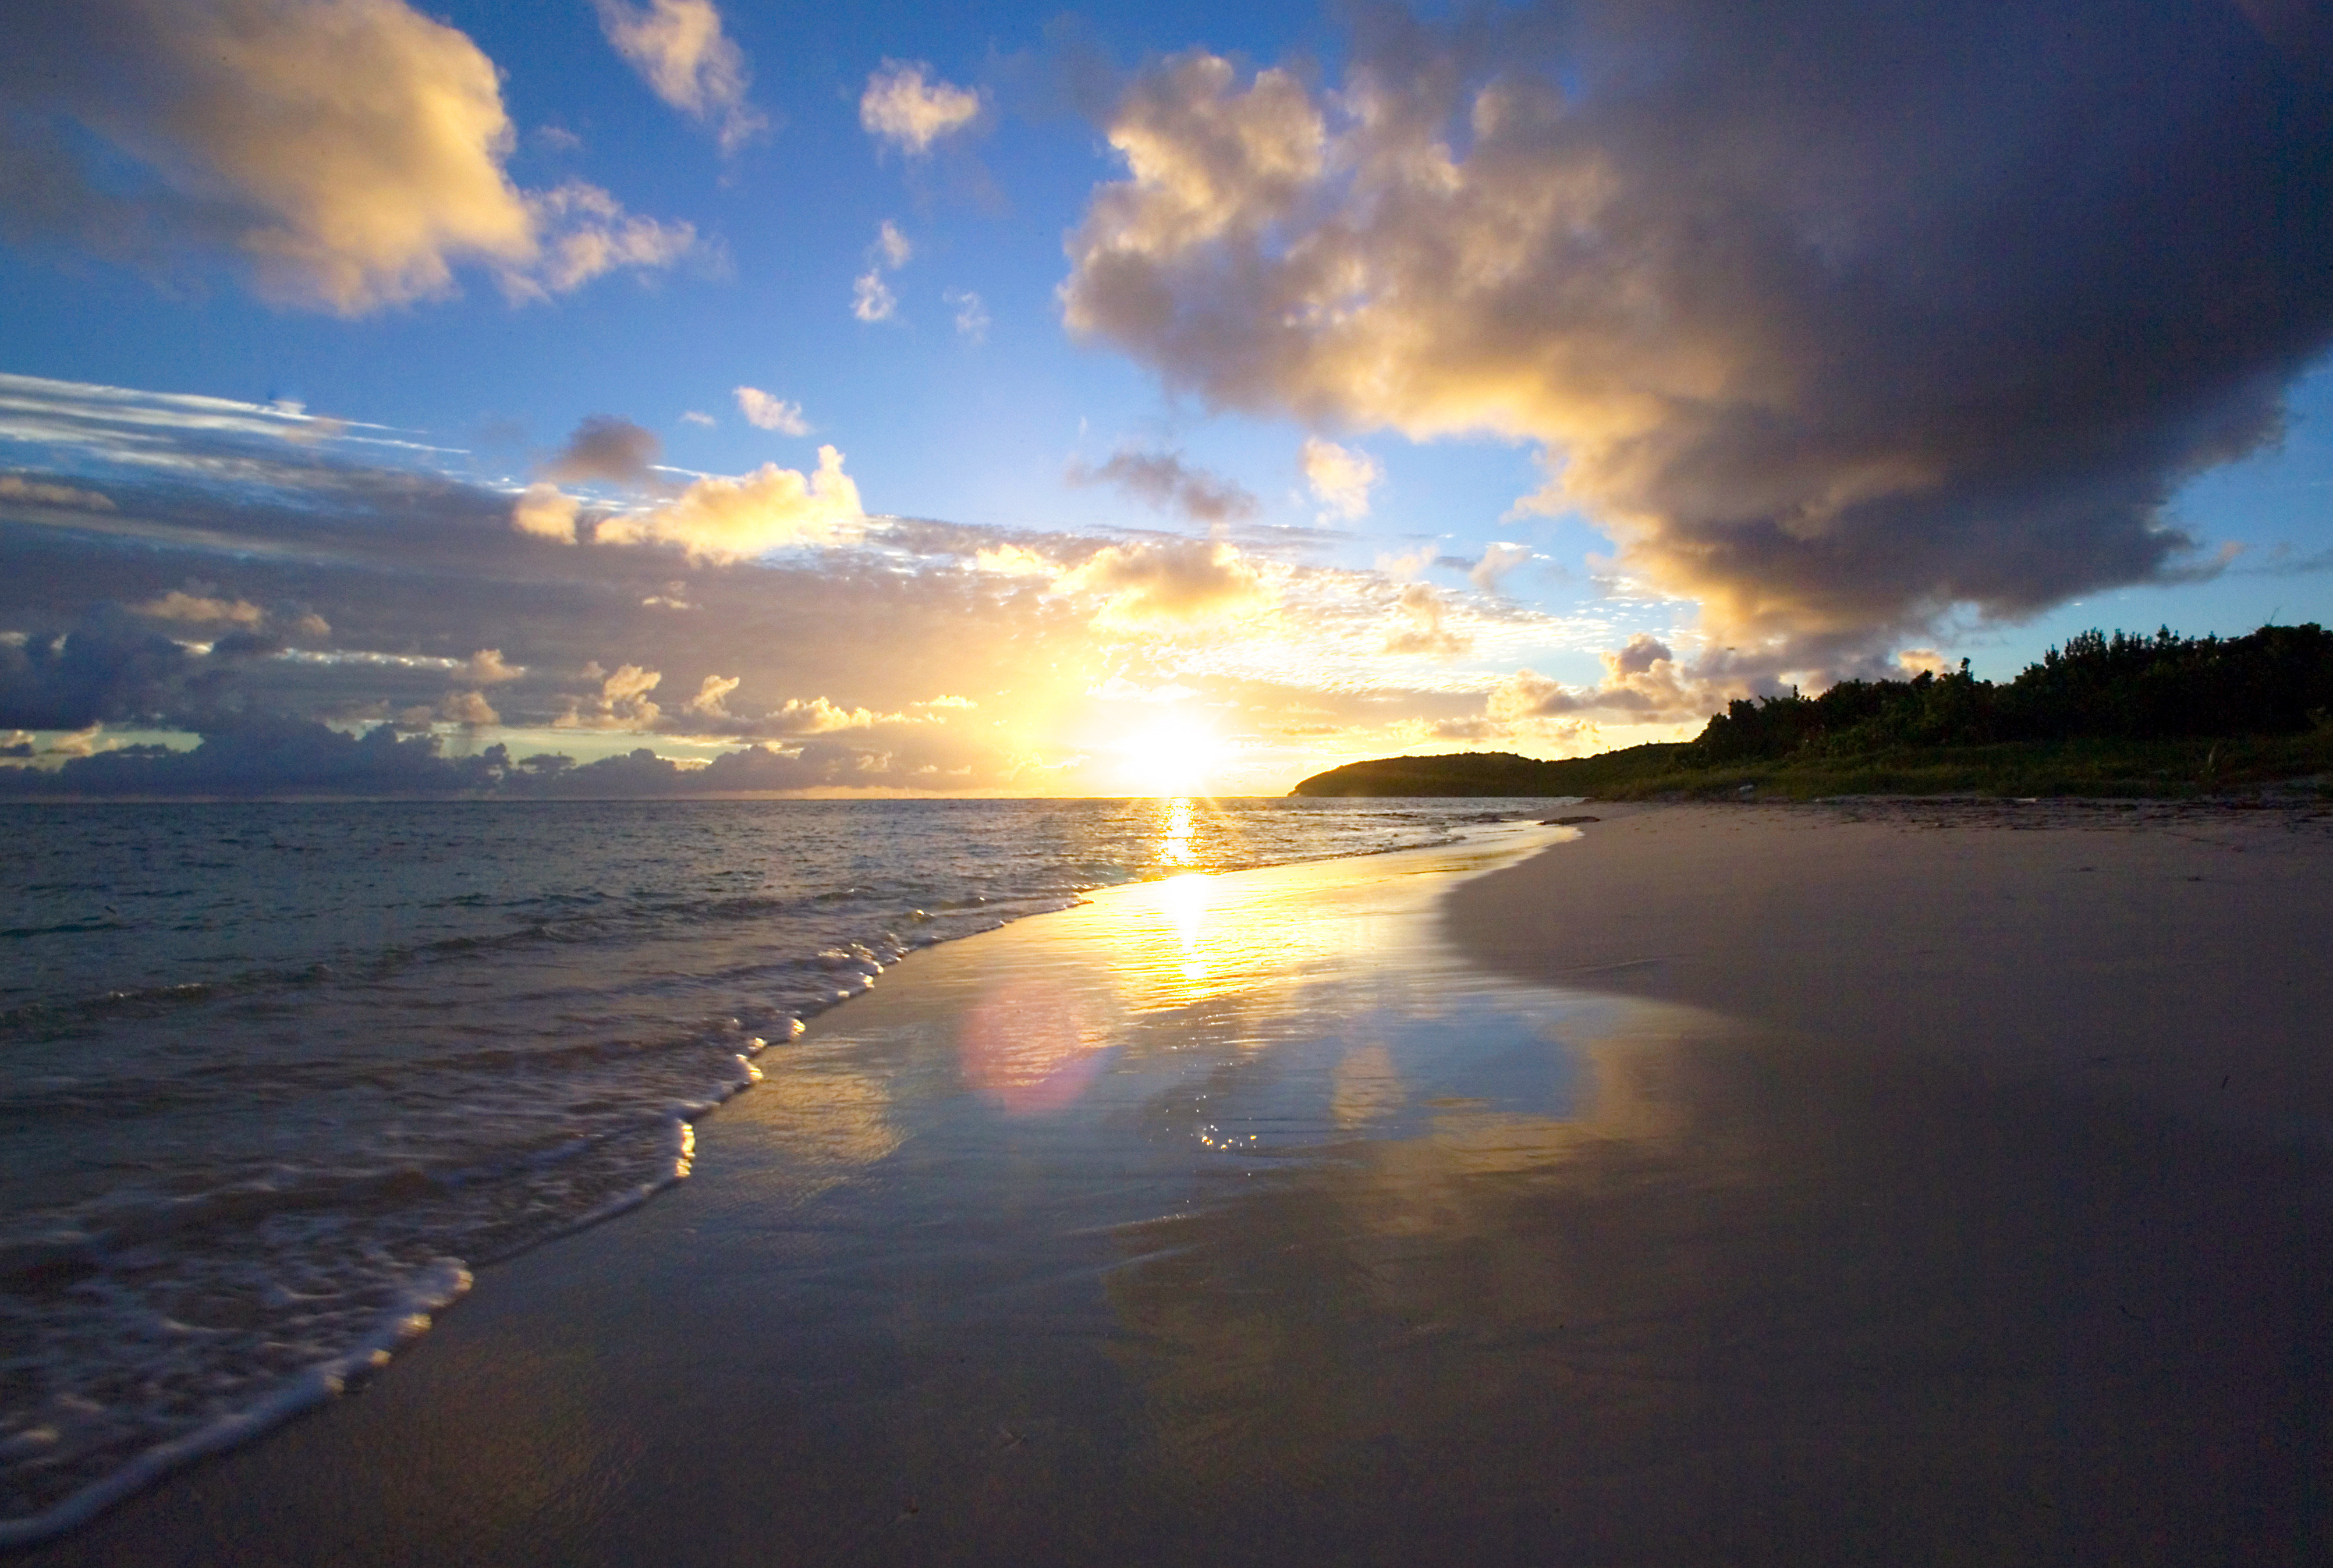 Beach Beachfront Resort Scenic views Sunset sky water clouds cloud Sea Nature horizon shore sunrise Ocean Coast Sun dawn afterglow sunlight dusk morning evening wave cloudy day sandy